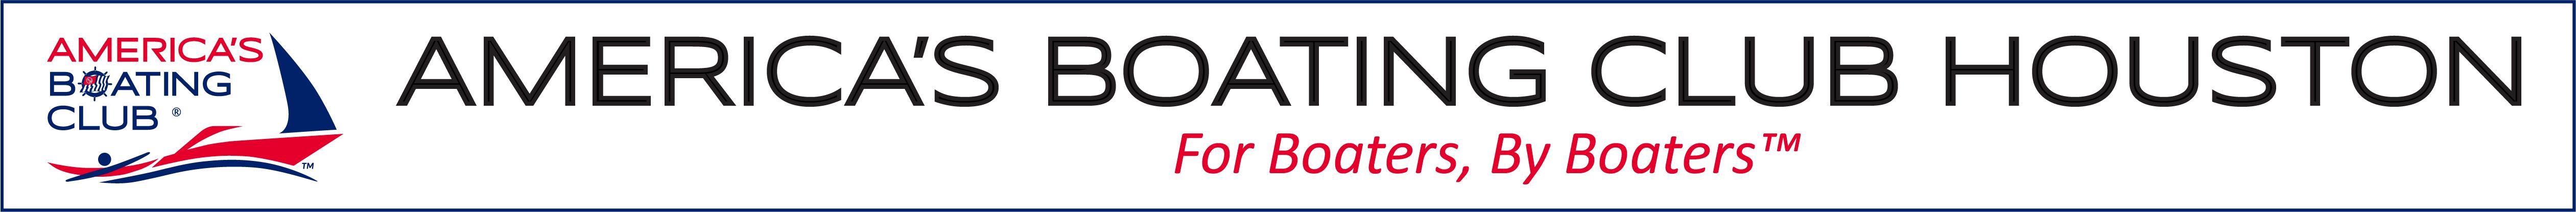 America's Boating Club® Houston